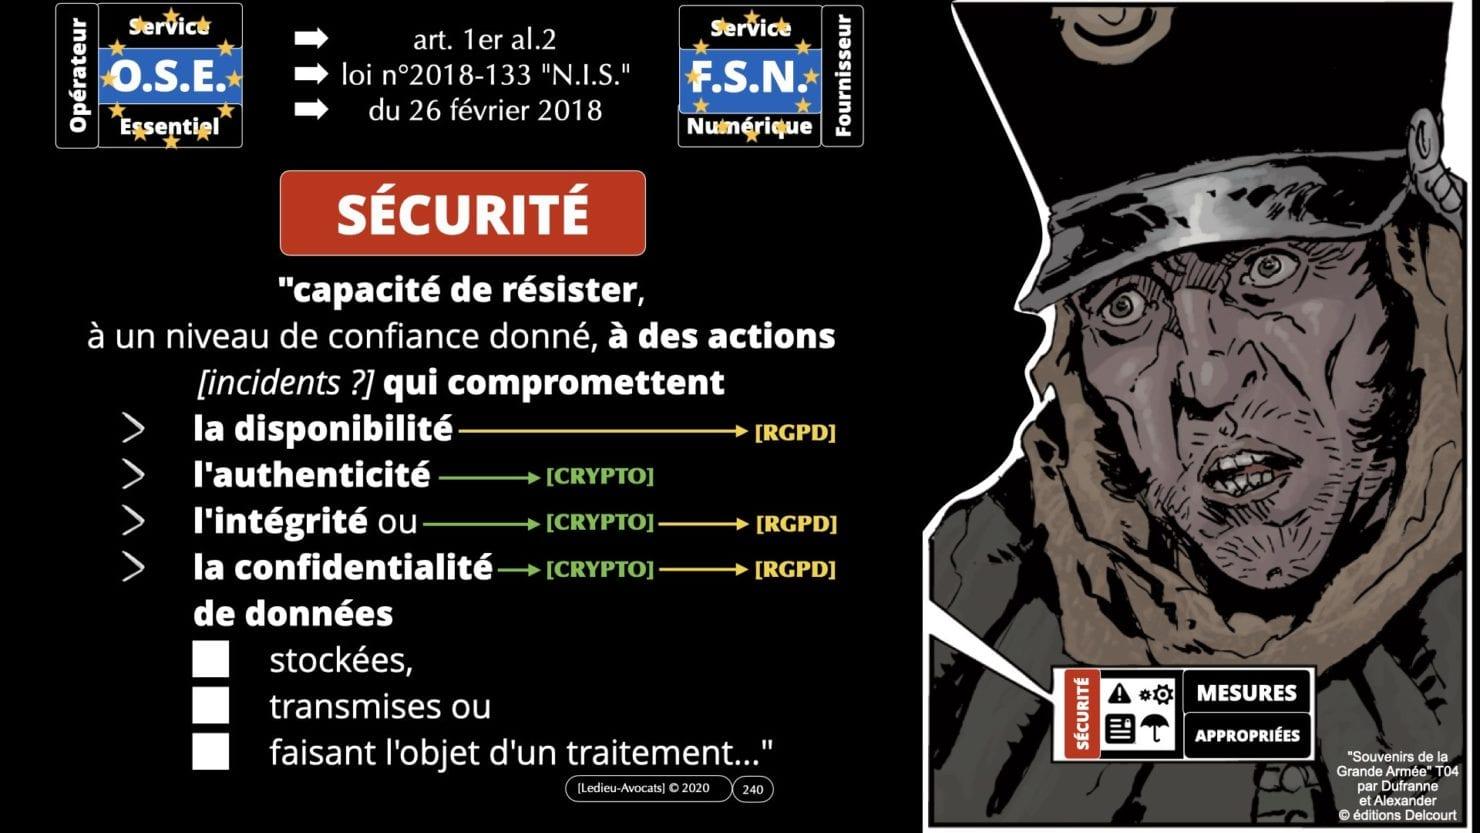 RGPD e-Privacy principes actualité jurisprudence ©Ledieu-Avocats 25-06-2021.240